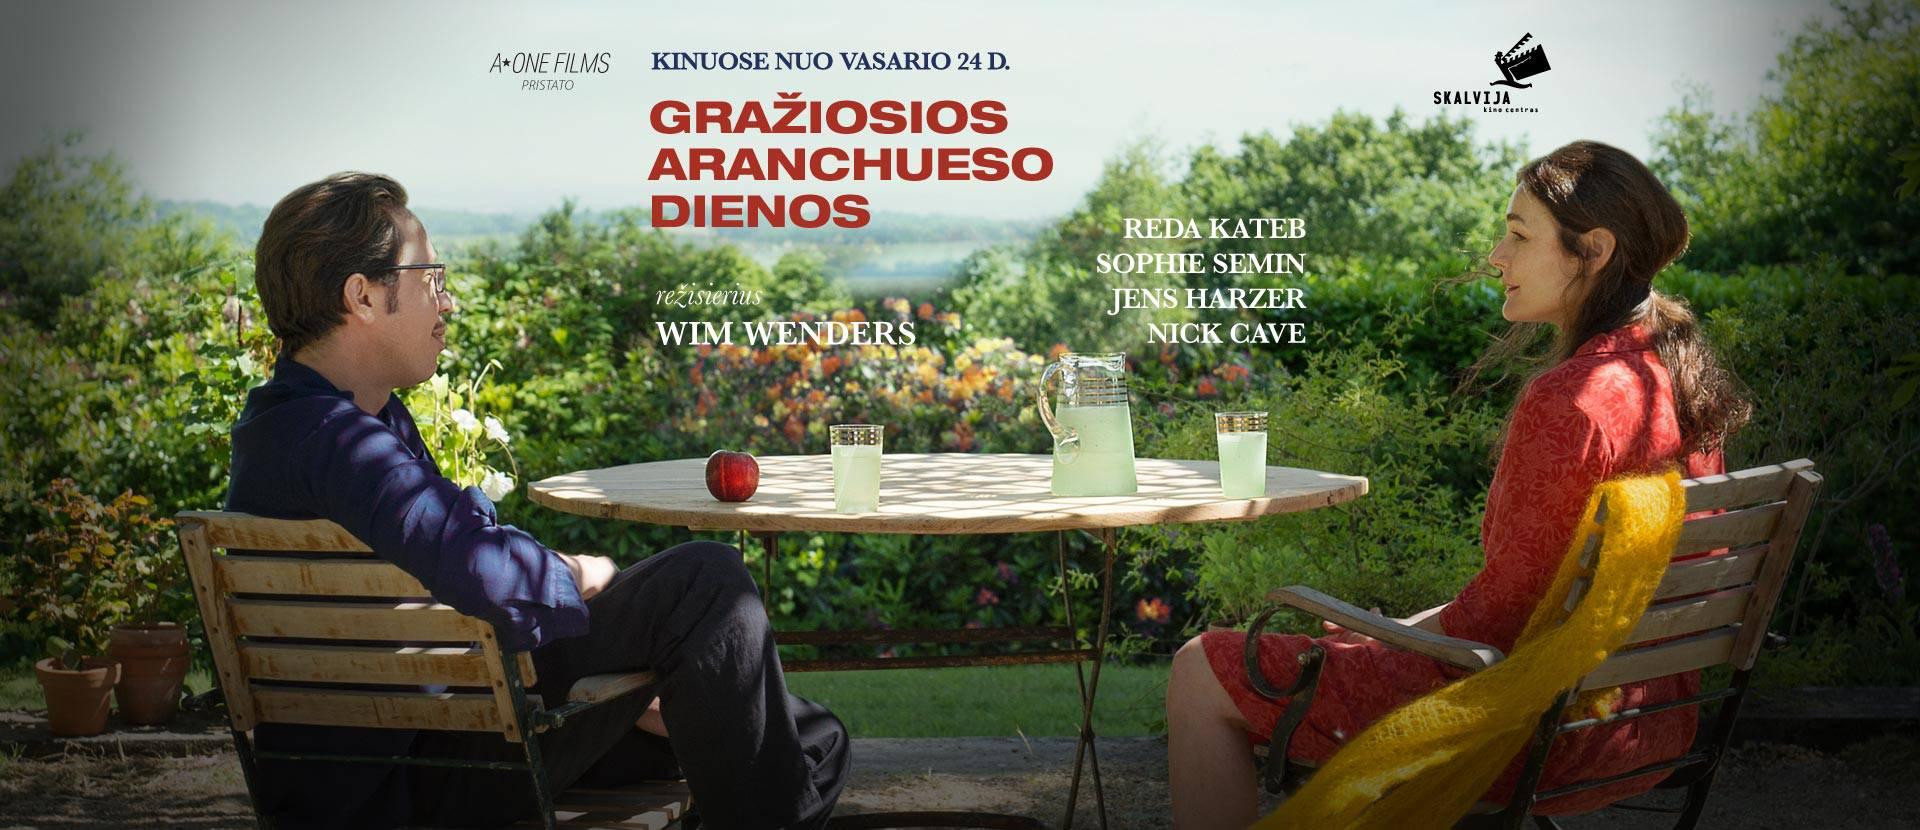 Gražiosios Aranchueso dienos (Skalvija)